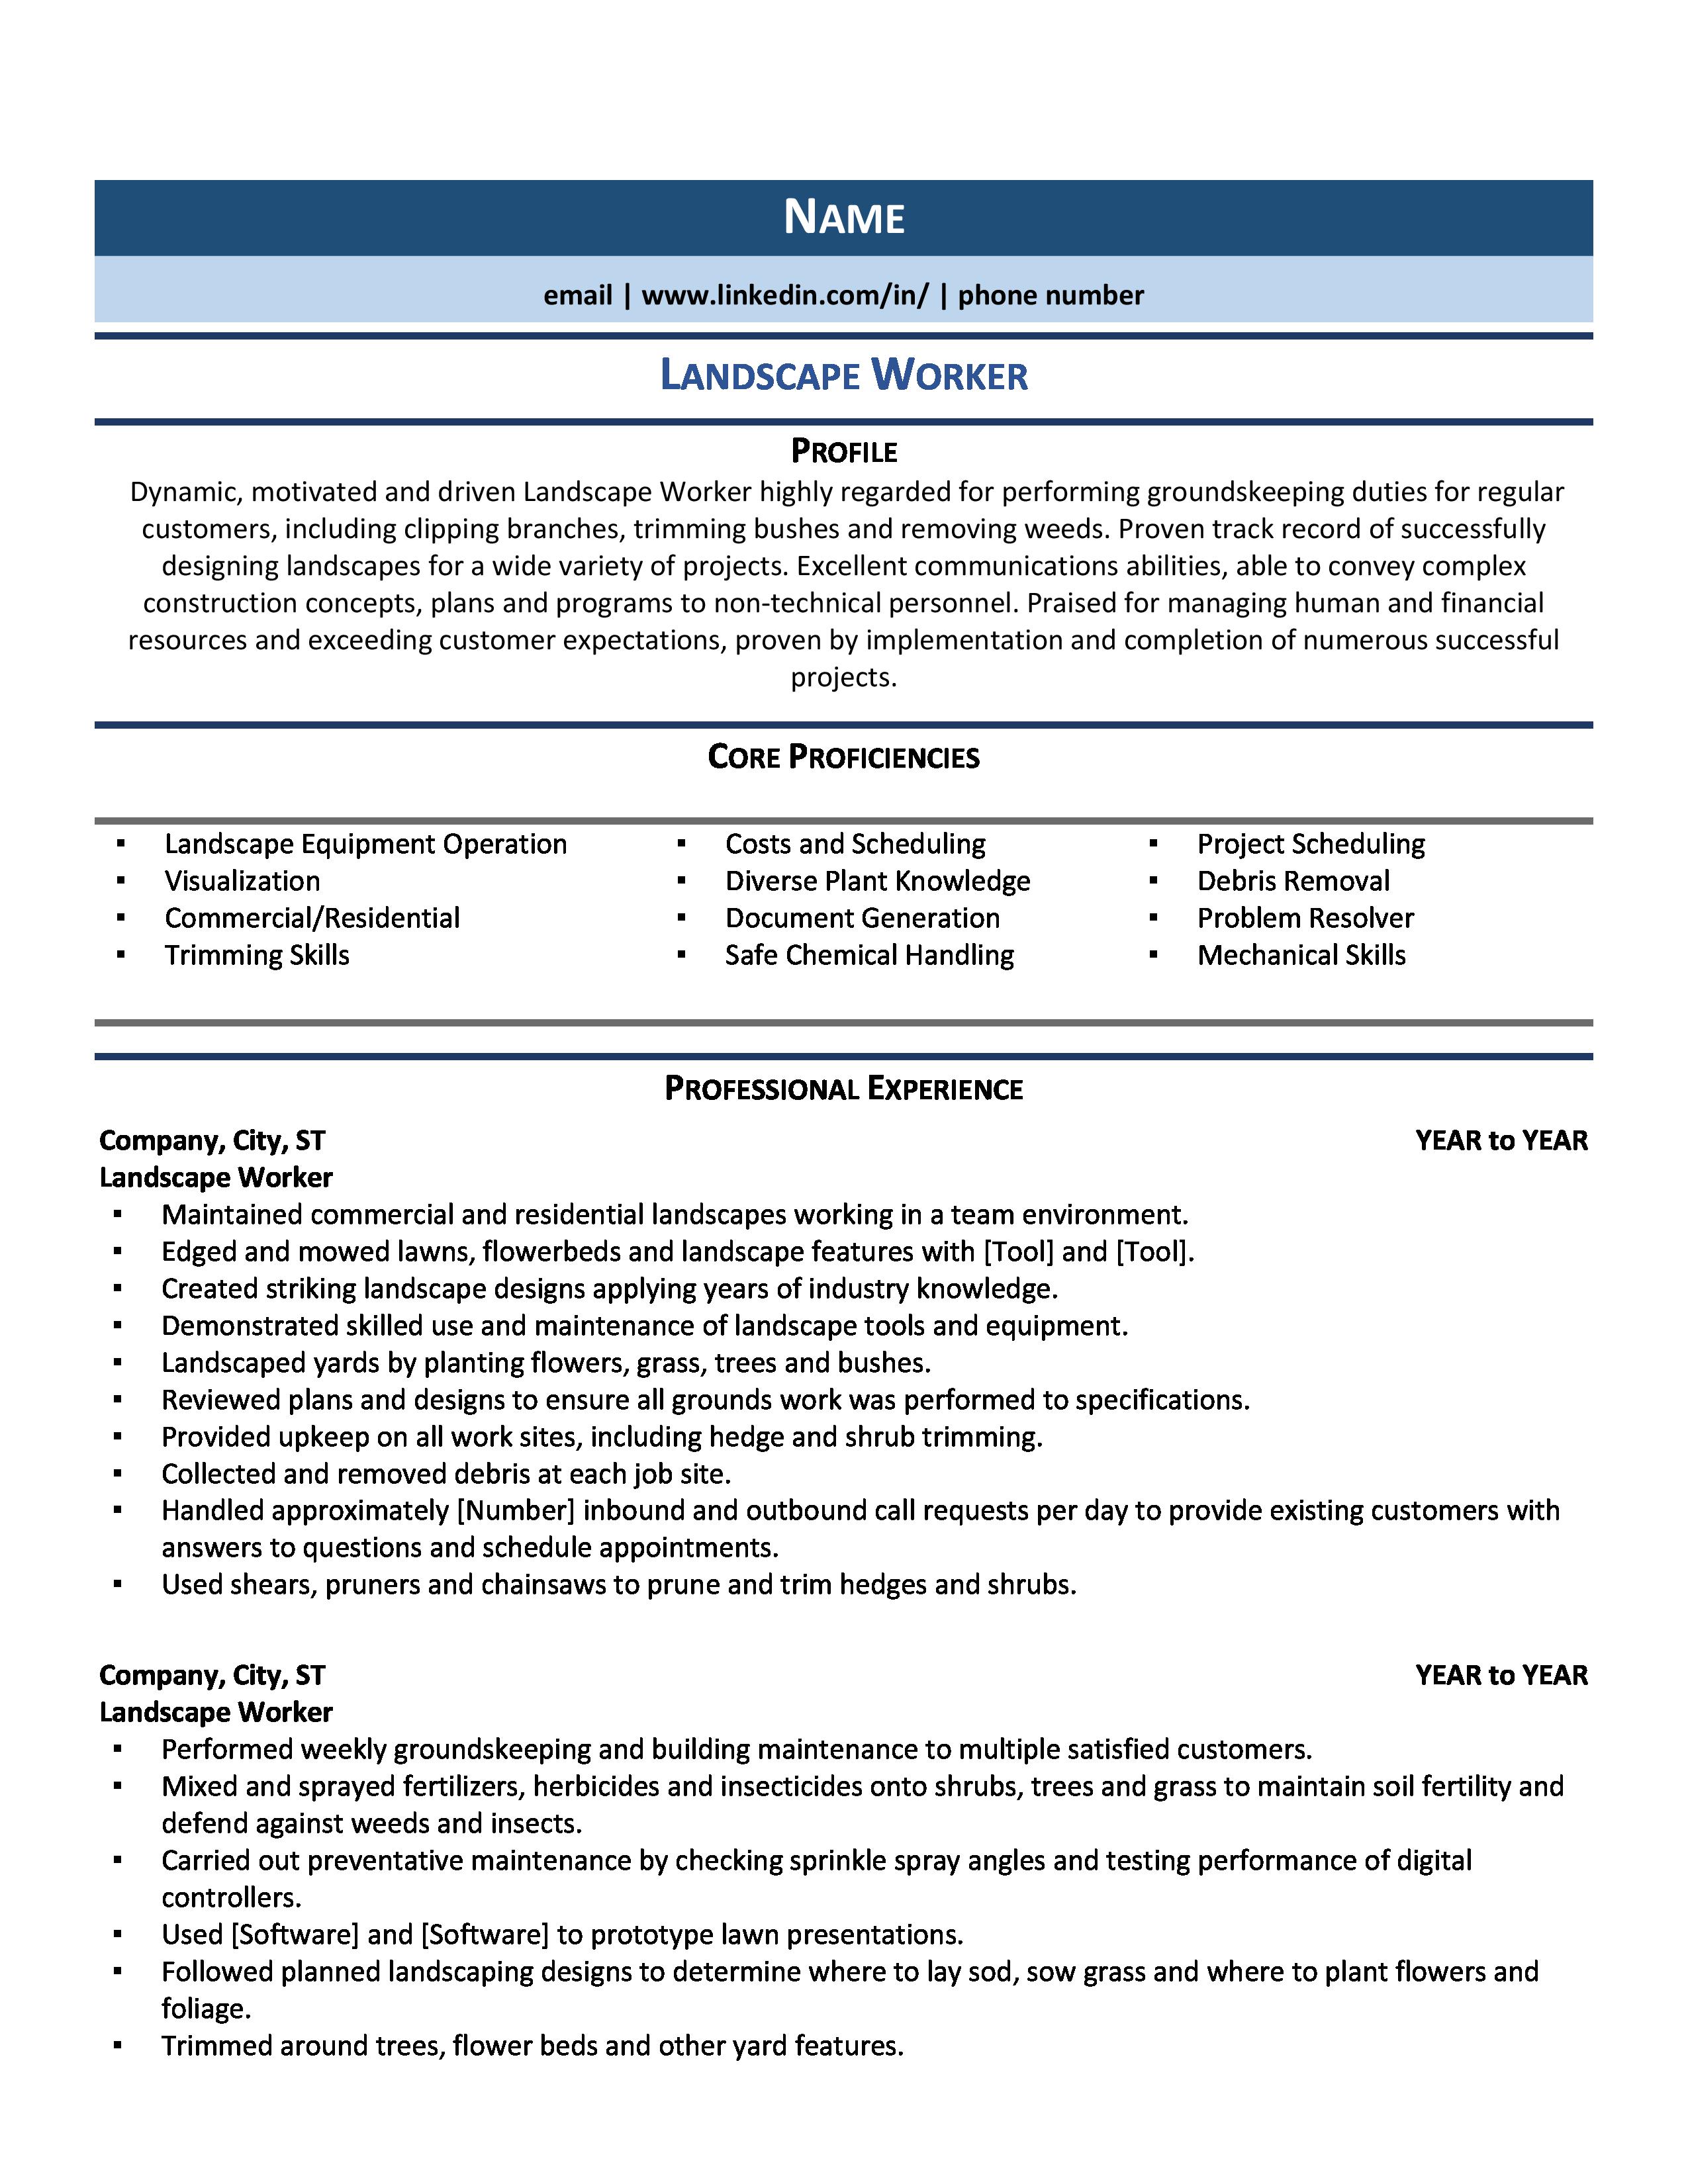 Landscaper Resume Samples Examples For 2020 Resume Examples Professional Resume Examples Resume Writing Tips